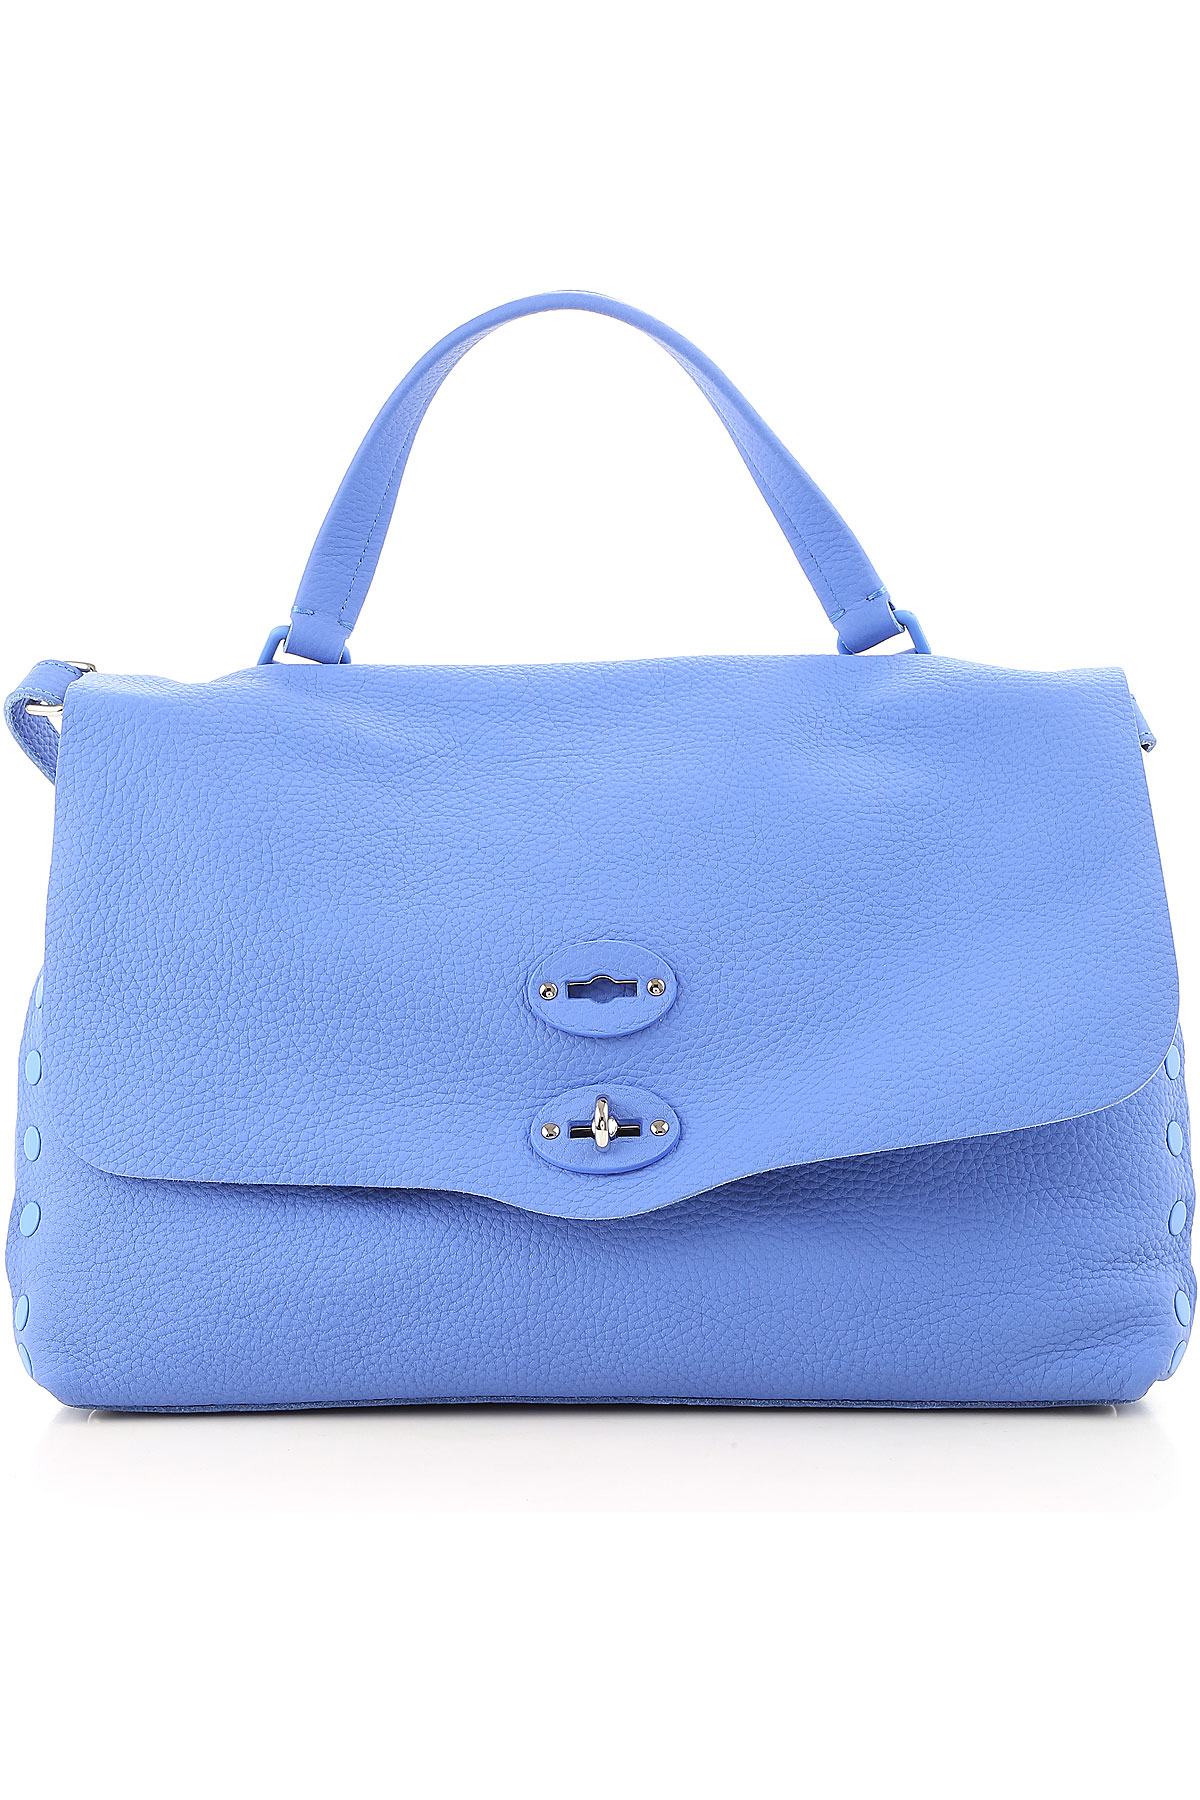 Image of Zanellato Shoulder Bag for Women On Sale, Marocain Blue, Leather, 2017